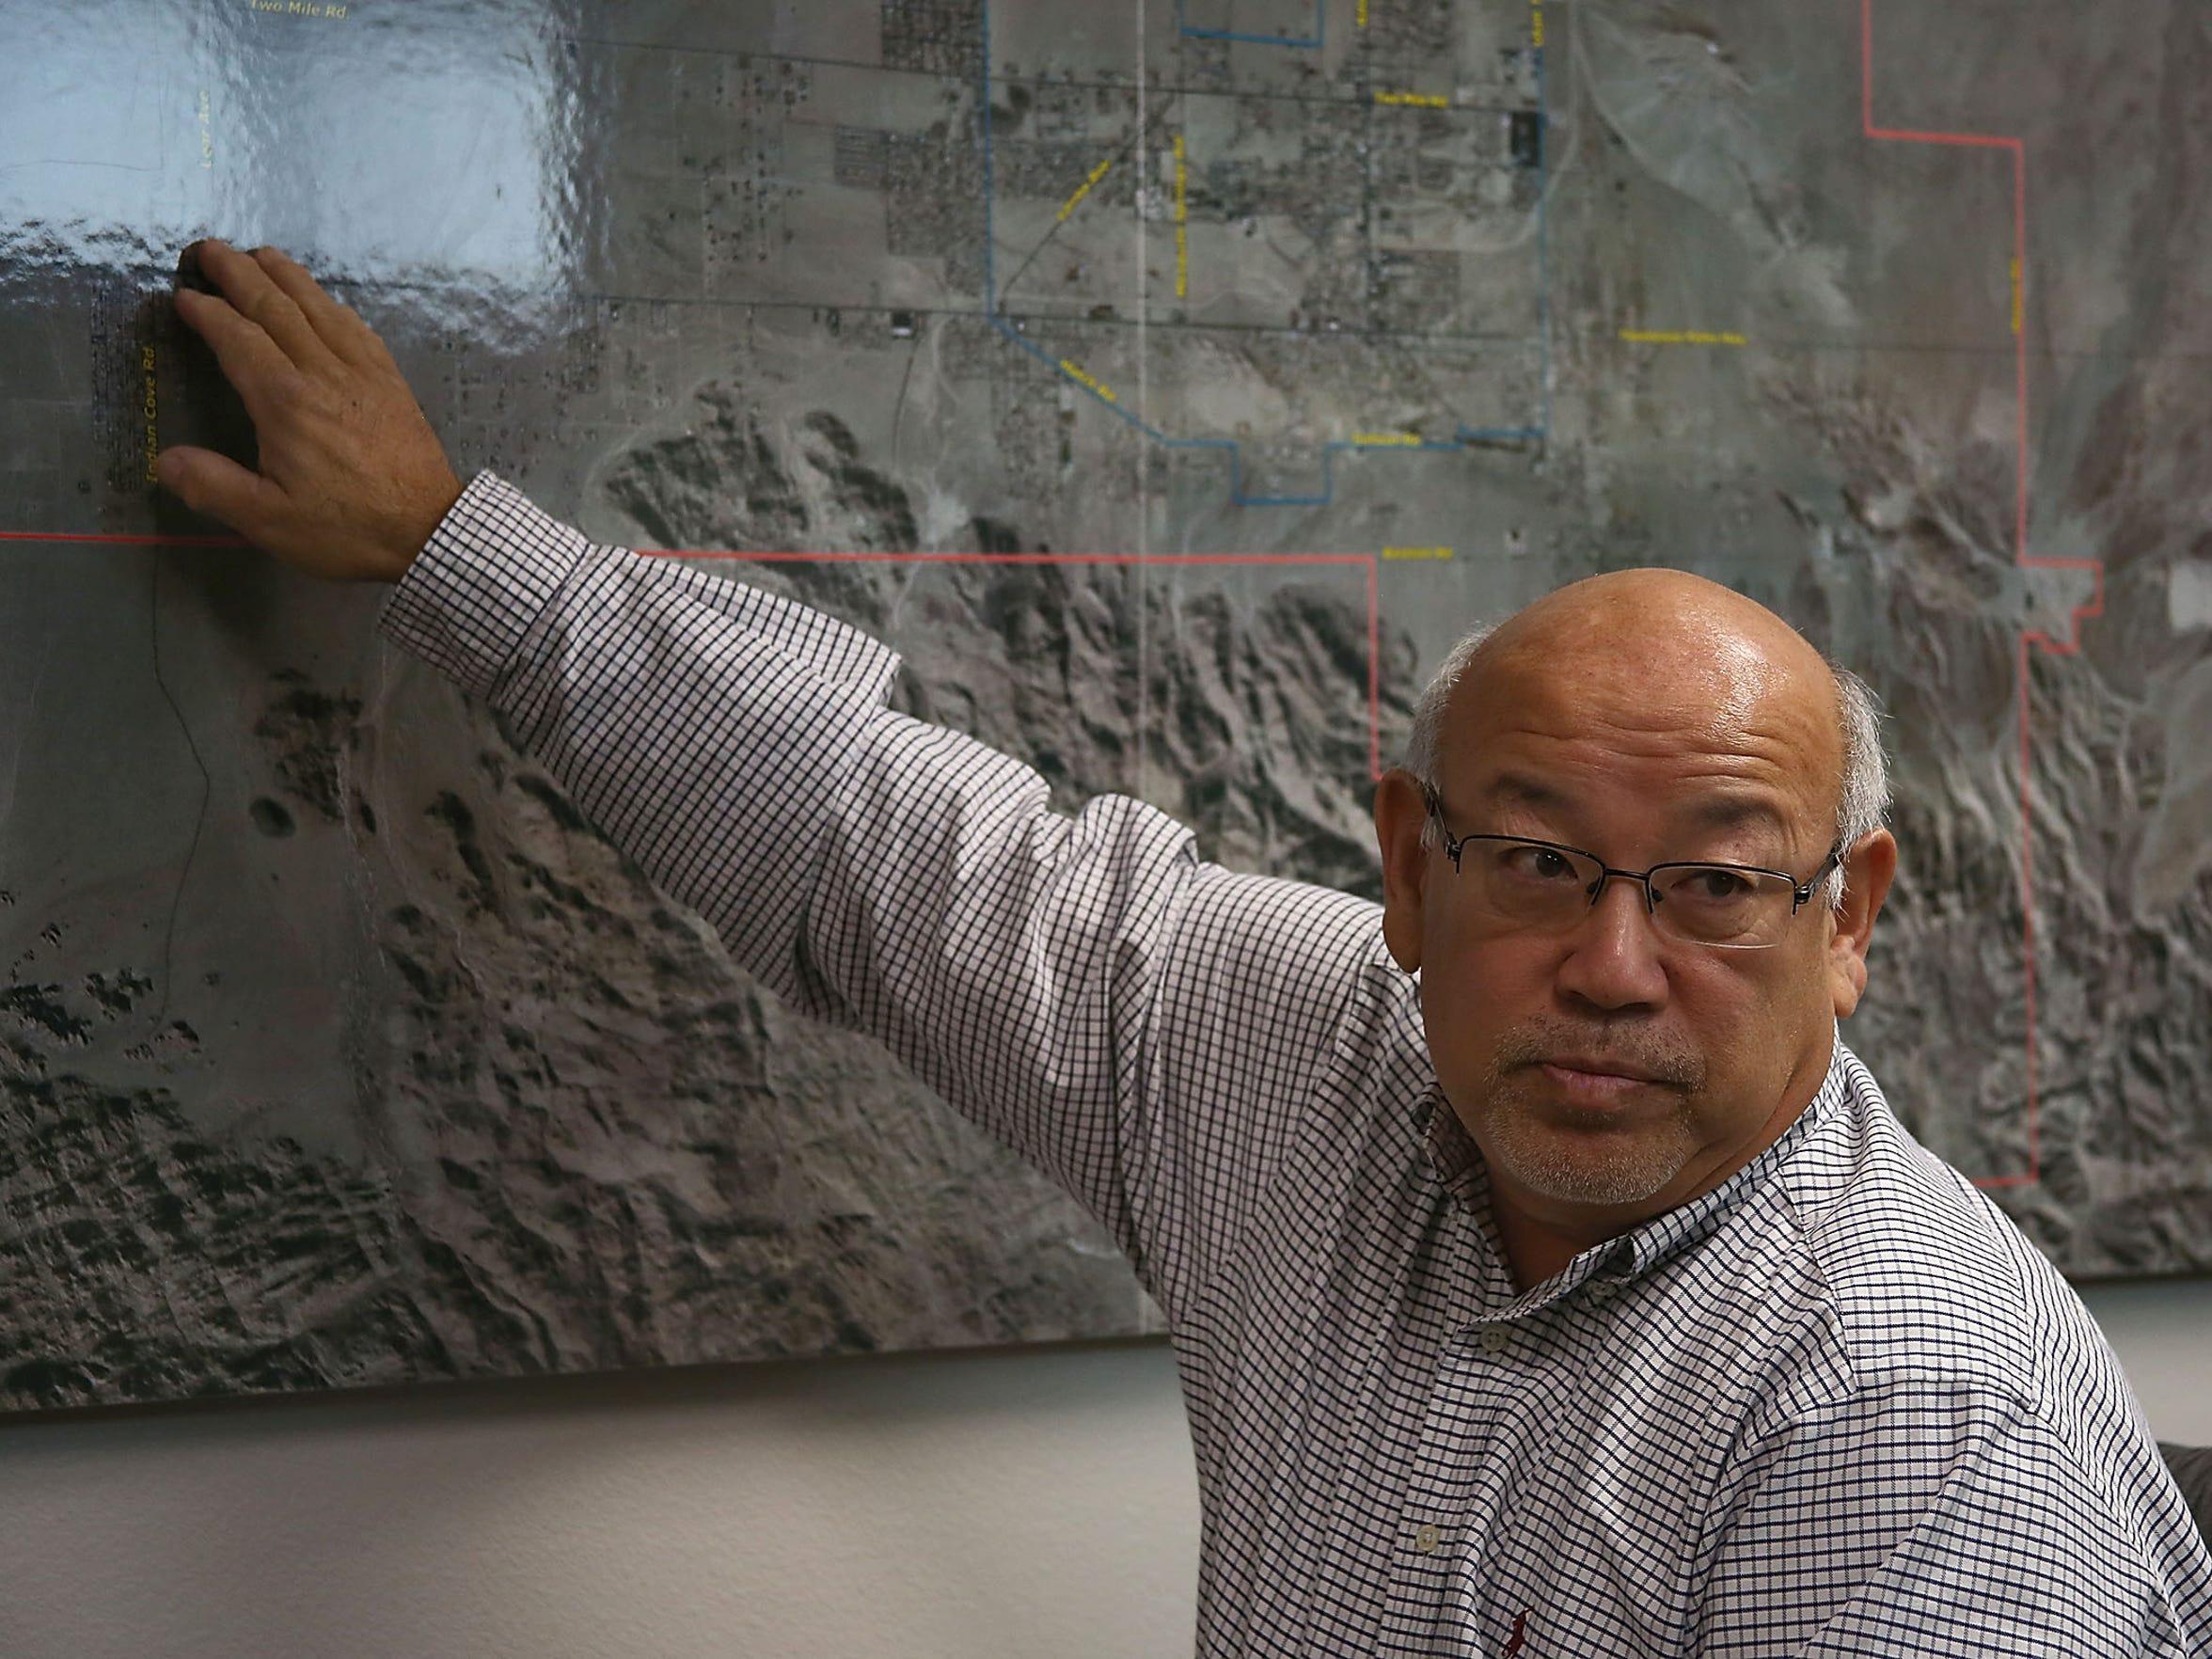 Twentynine Palms city manager Andy Takada talks about